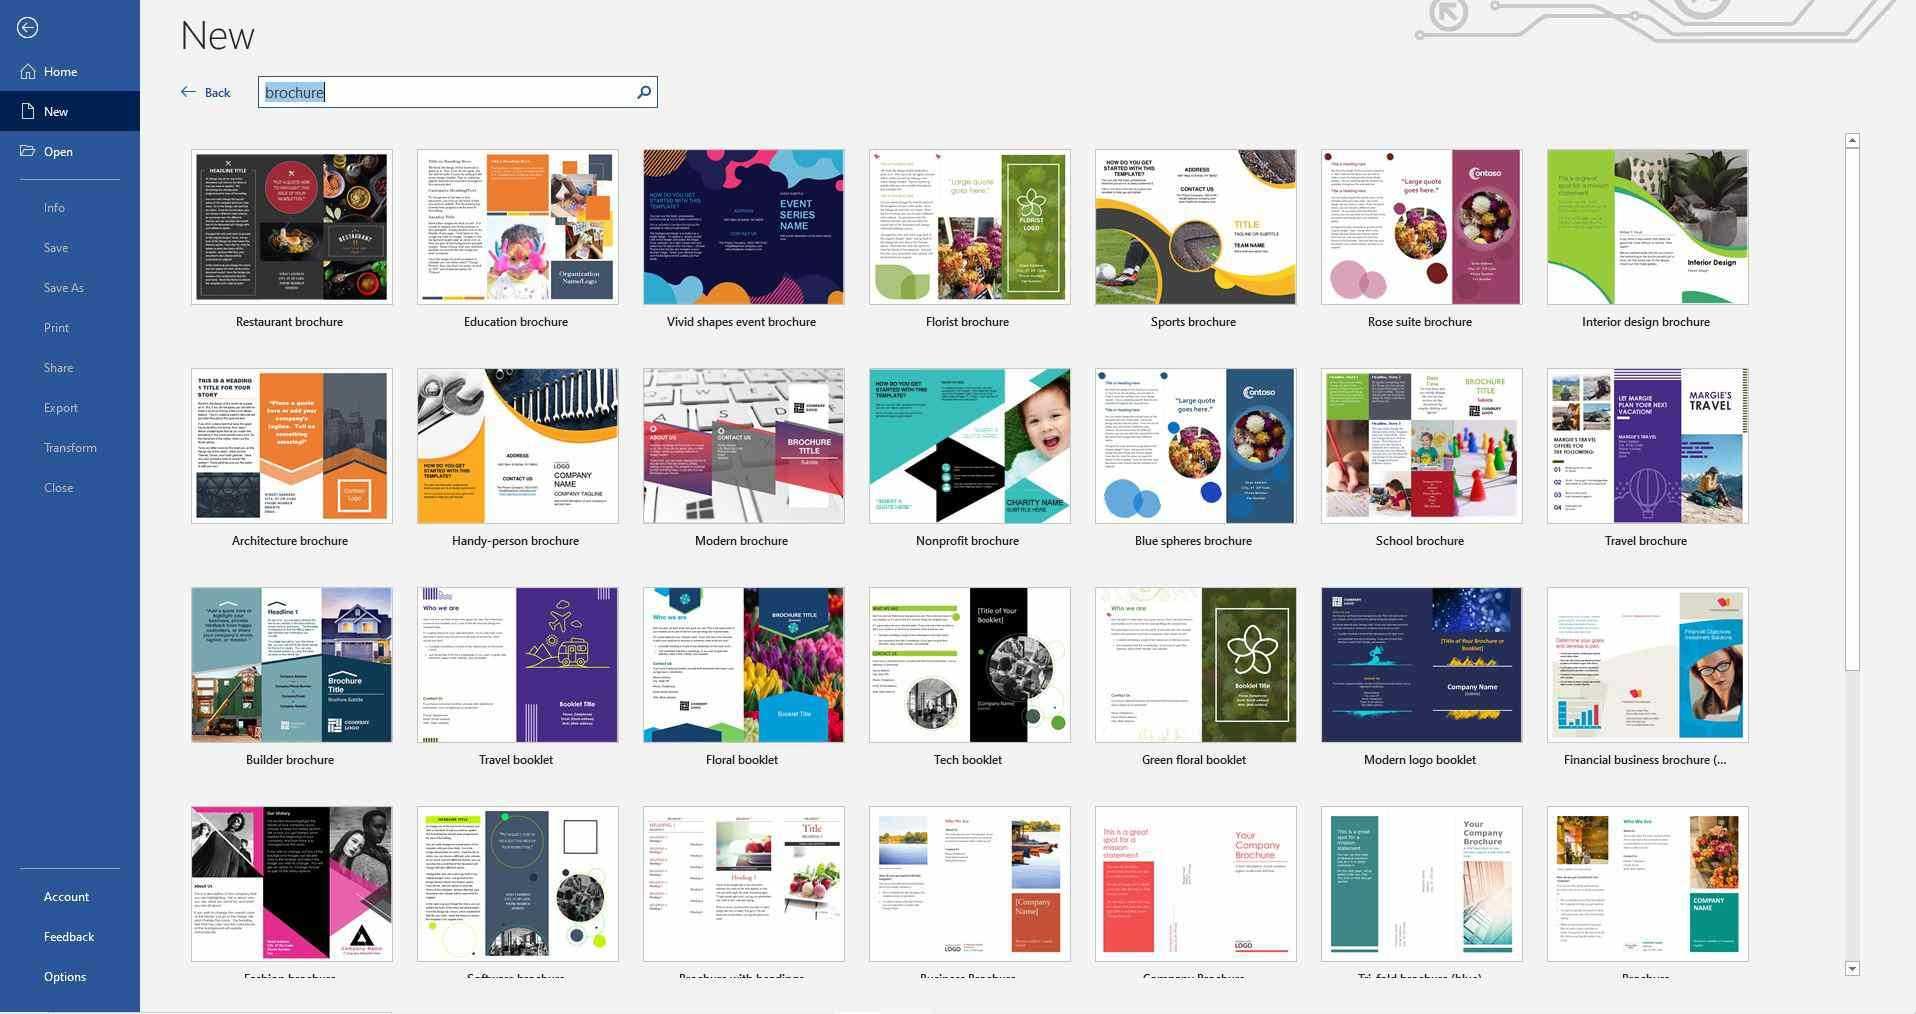 006 Template Ideas Capture Jpg Microsoft Word Striking intended for Word Travel Brochure Template